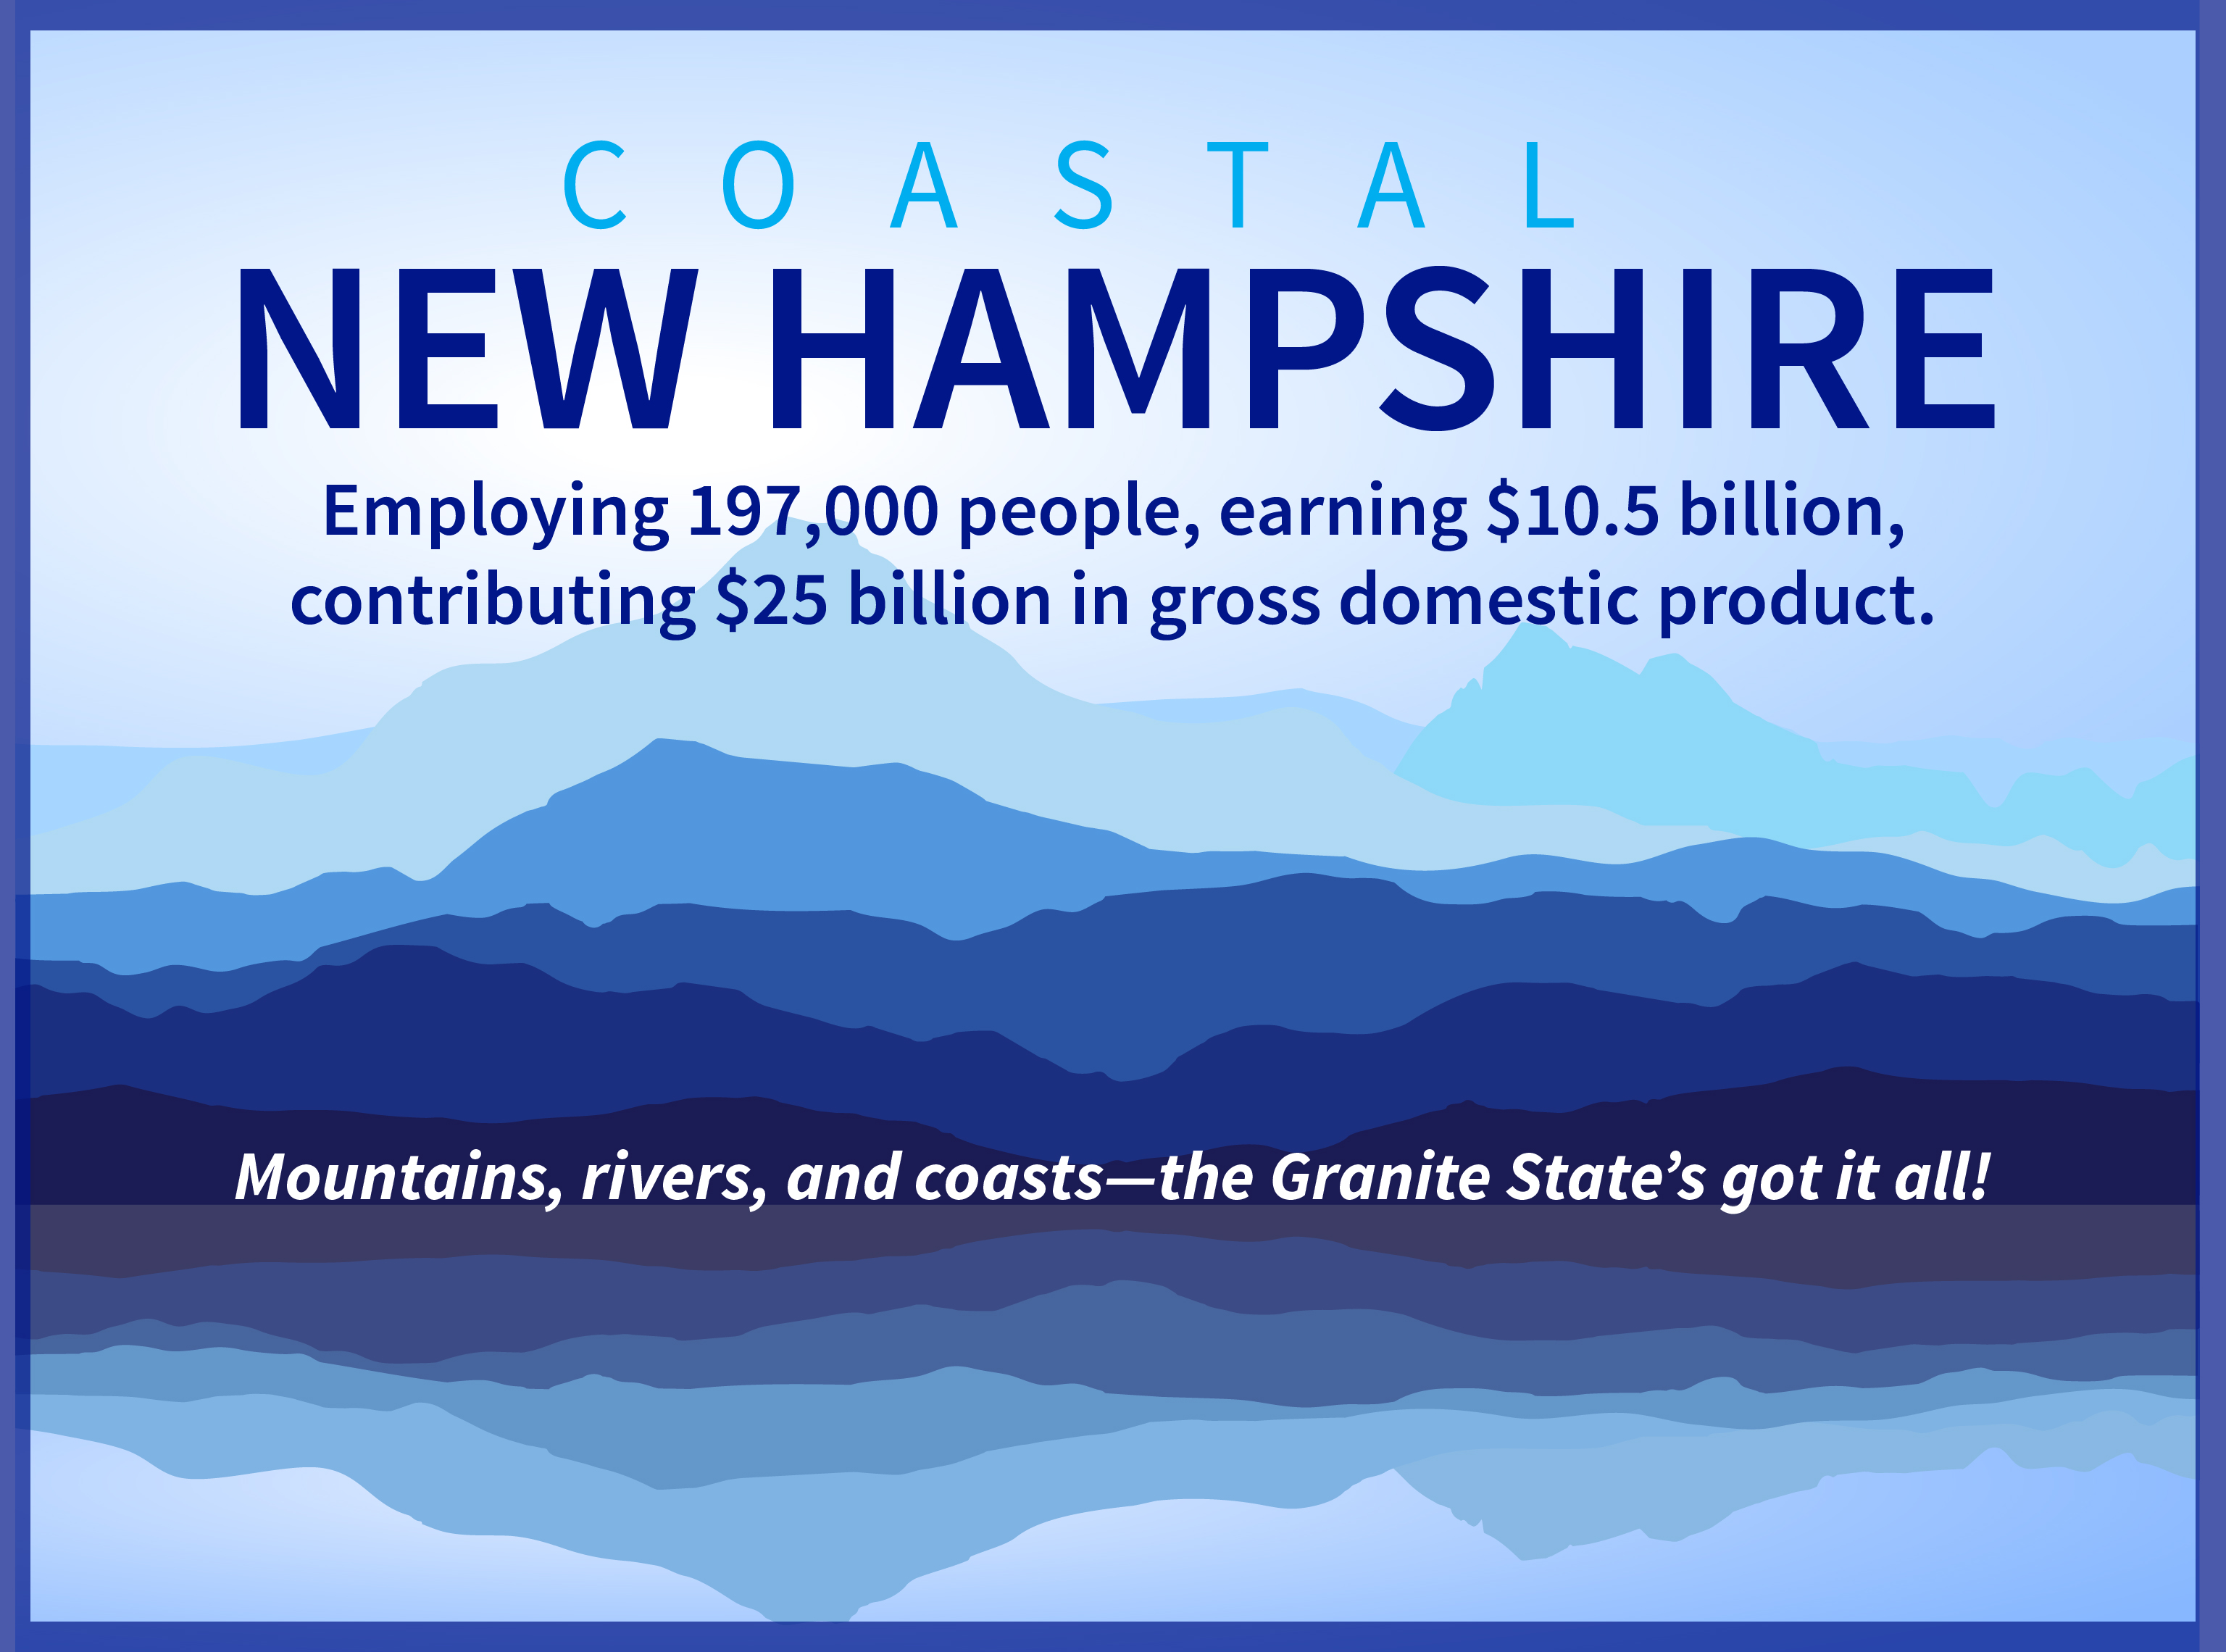 New Hampshire graphic